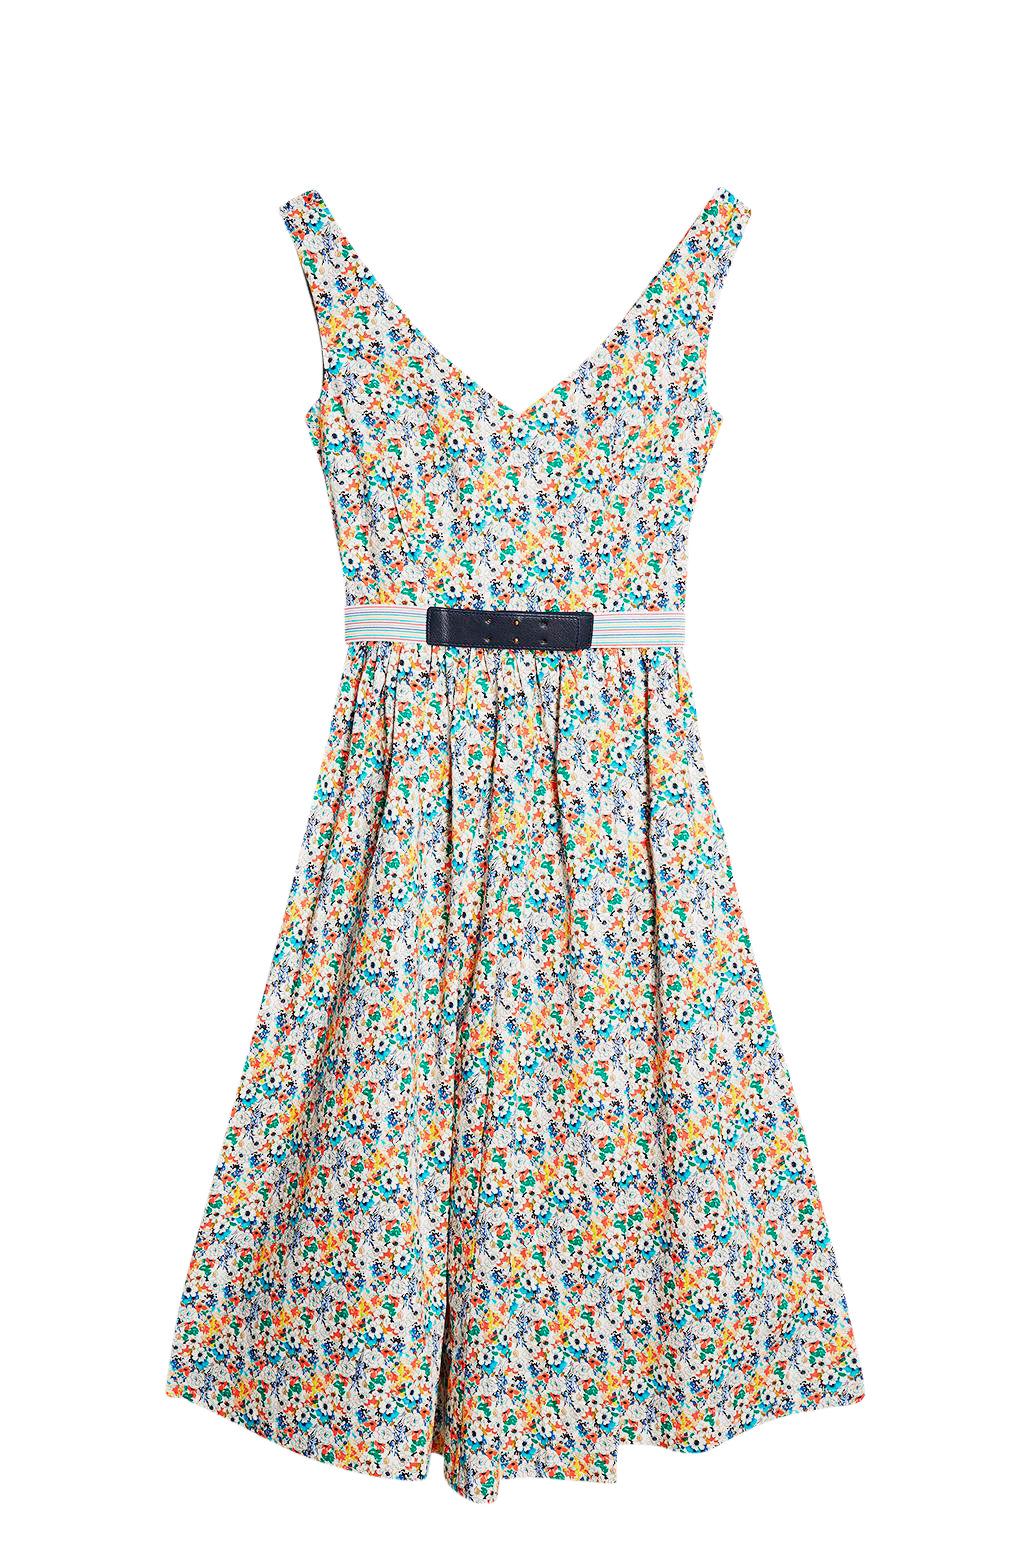 Kjole i 50'er stil Esprit Kjoler til Kvinder i Offwhite